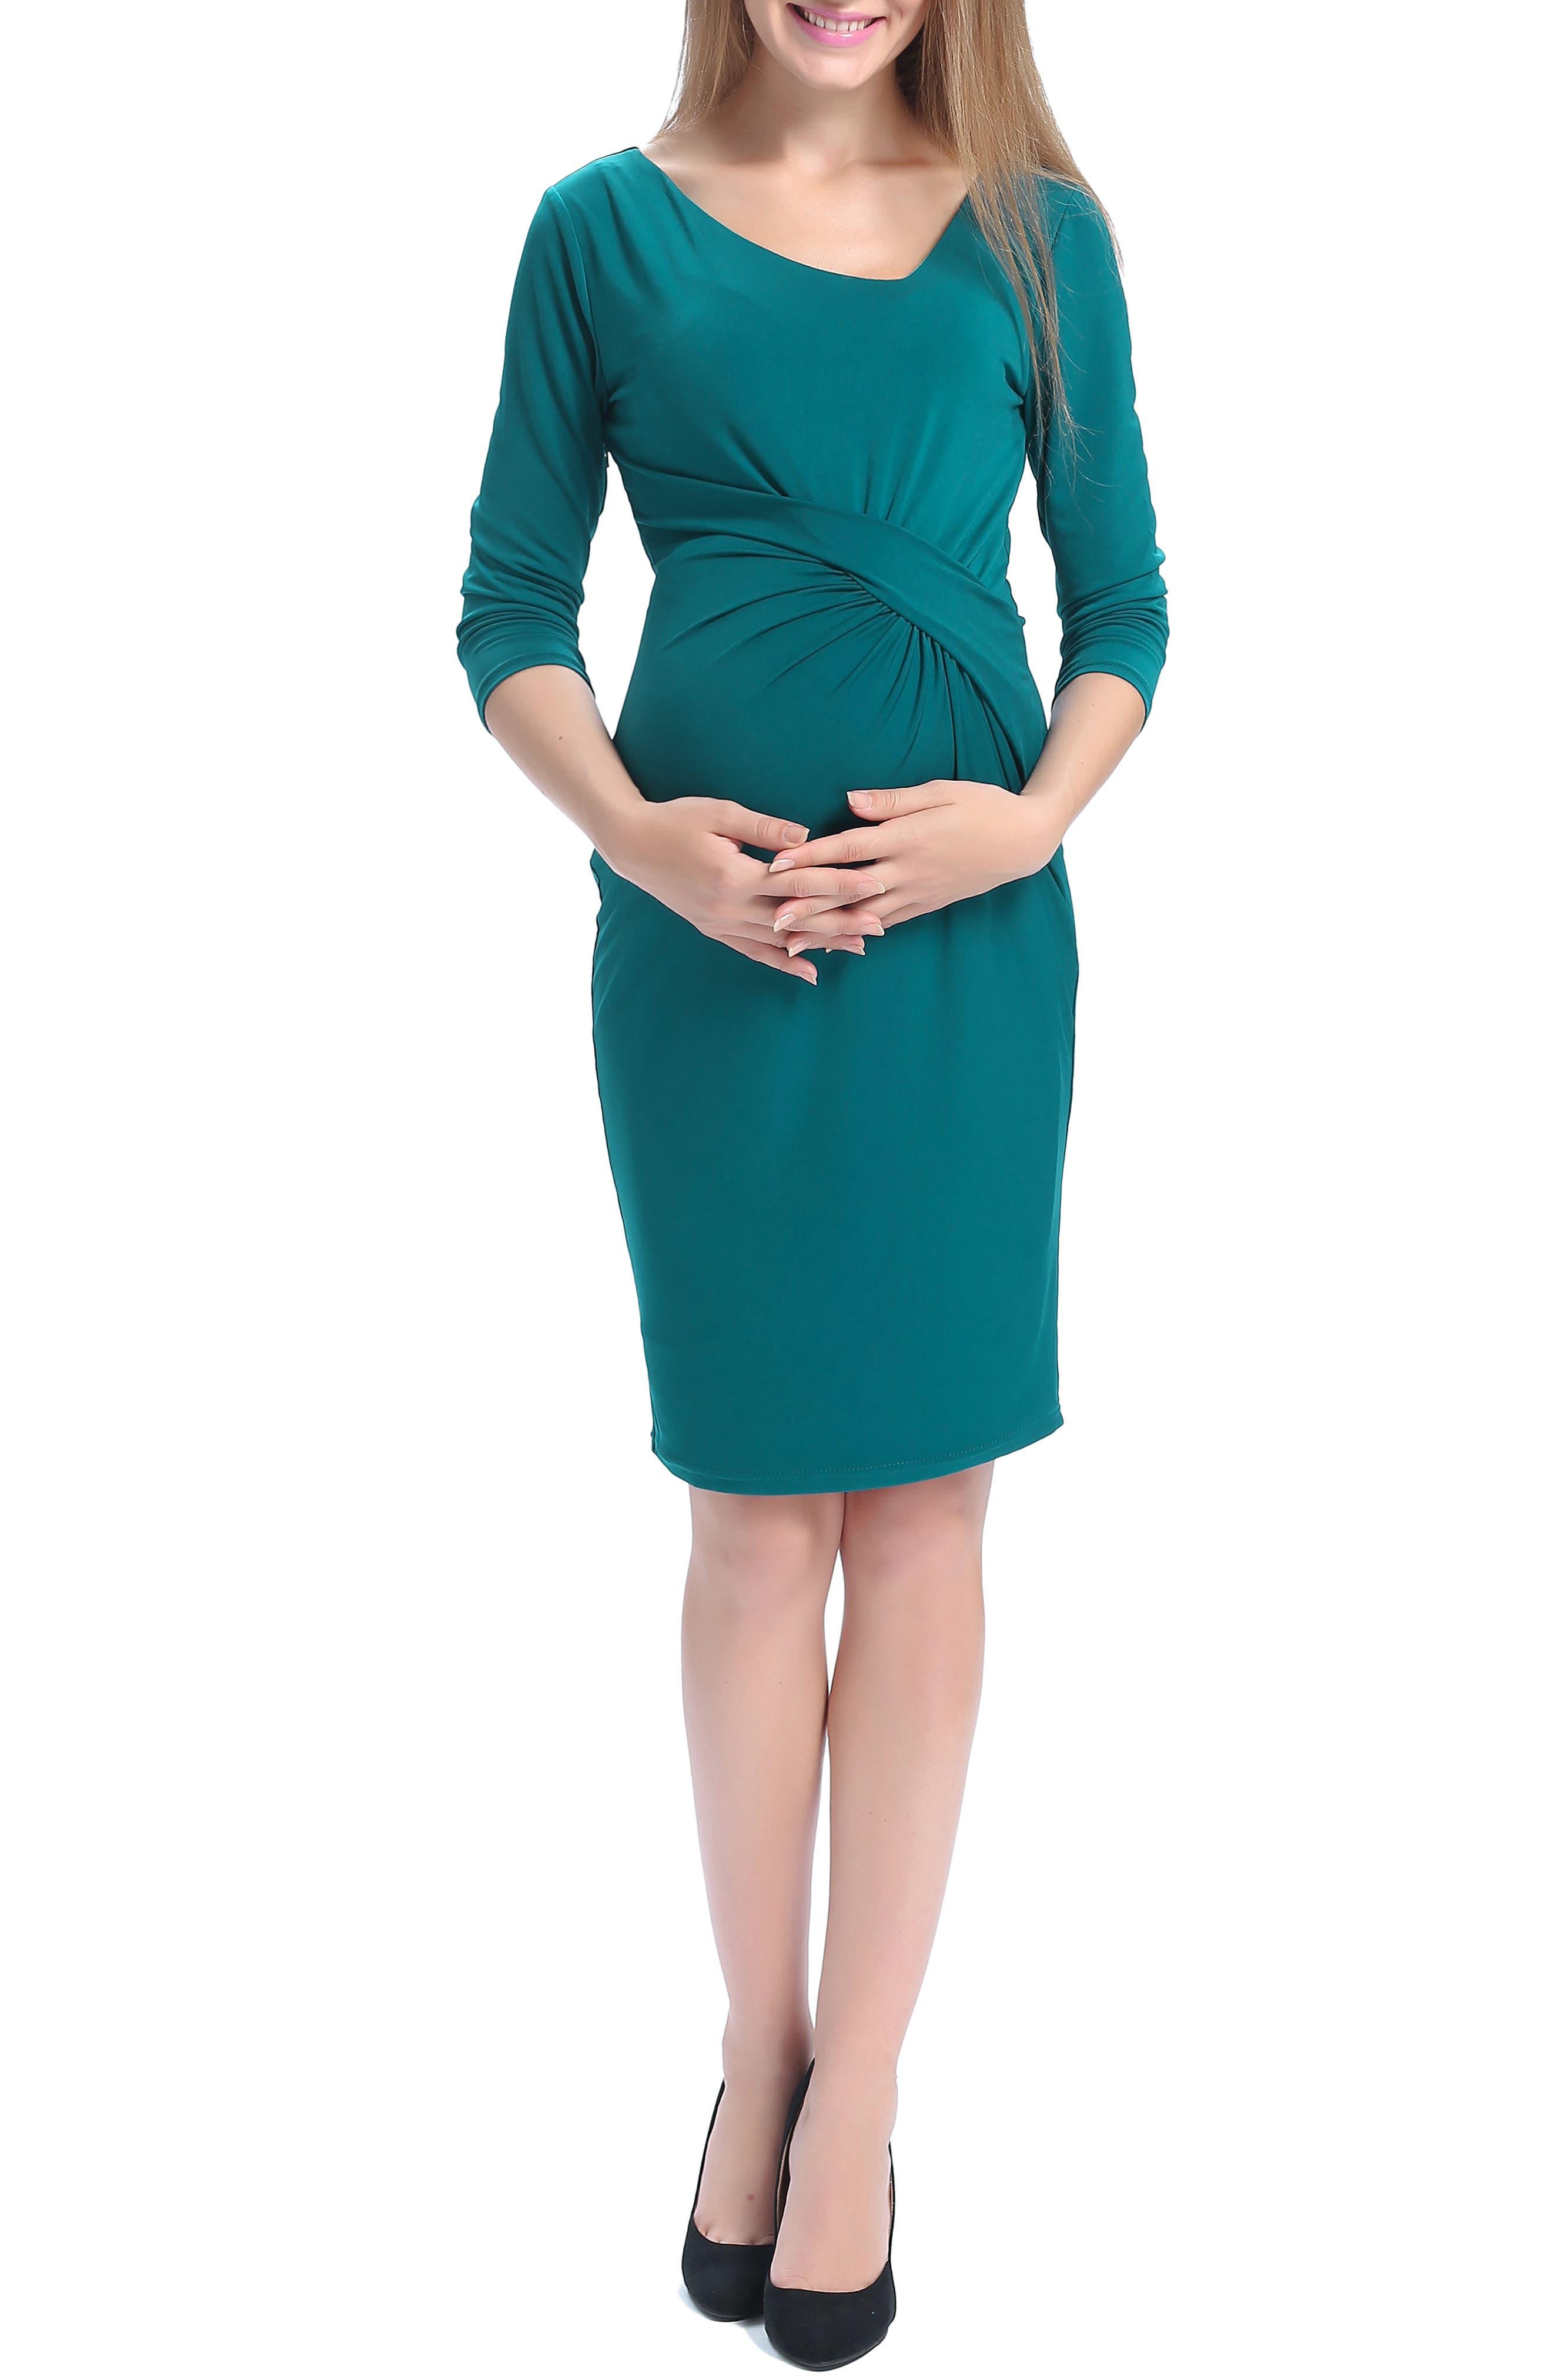 Teagan Body-Con Maternity Dress,                         Main,                         color, TEAL